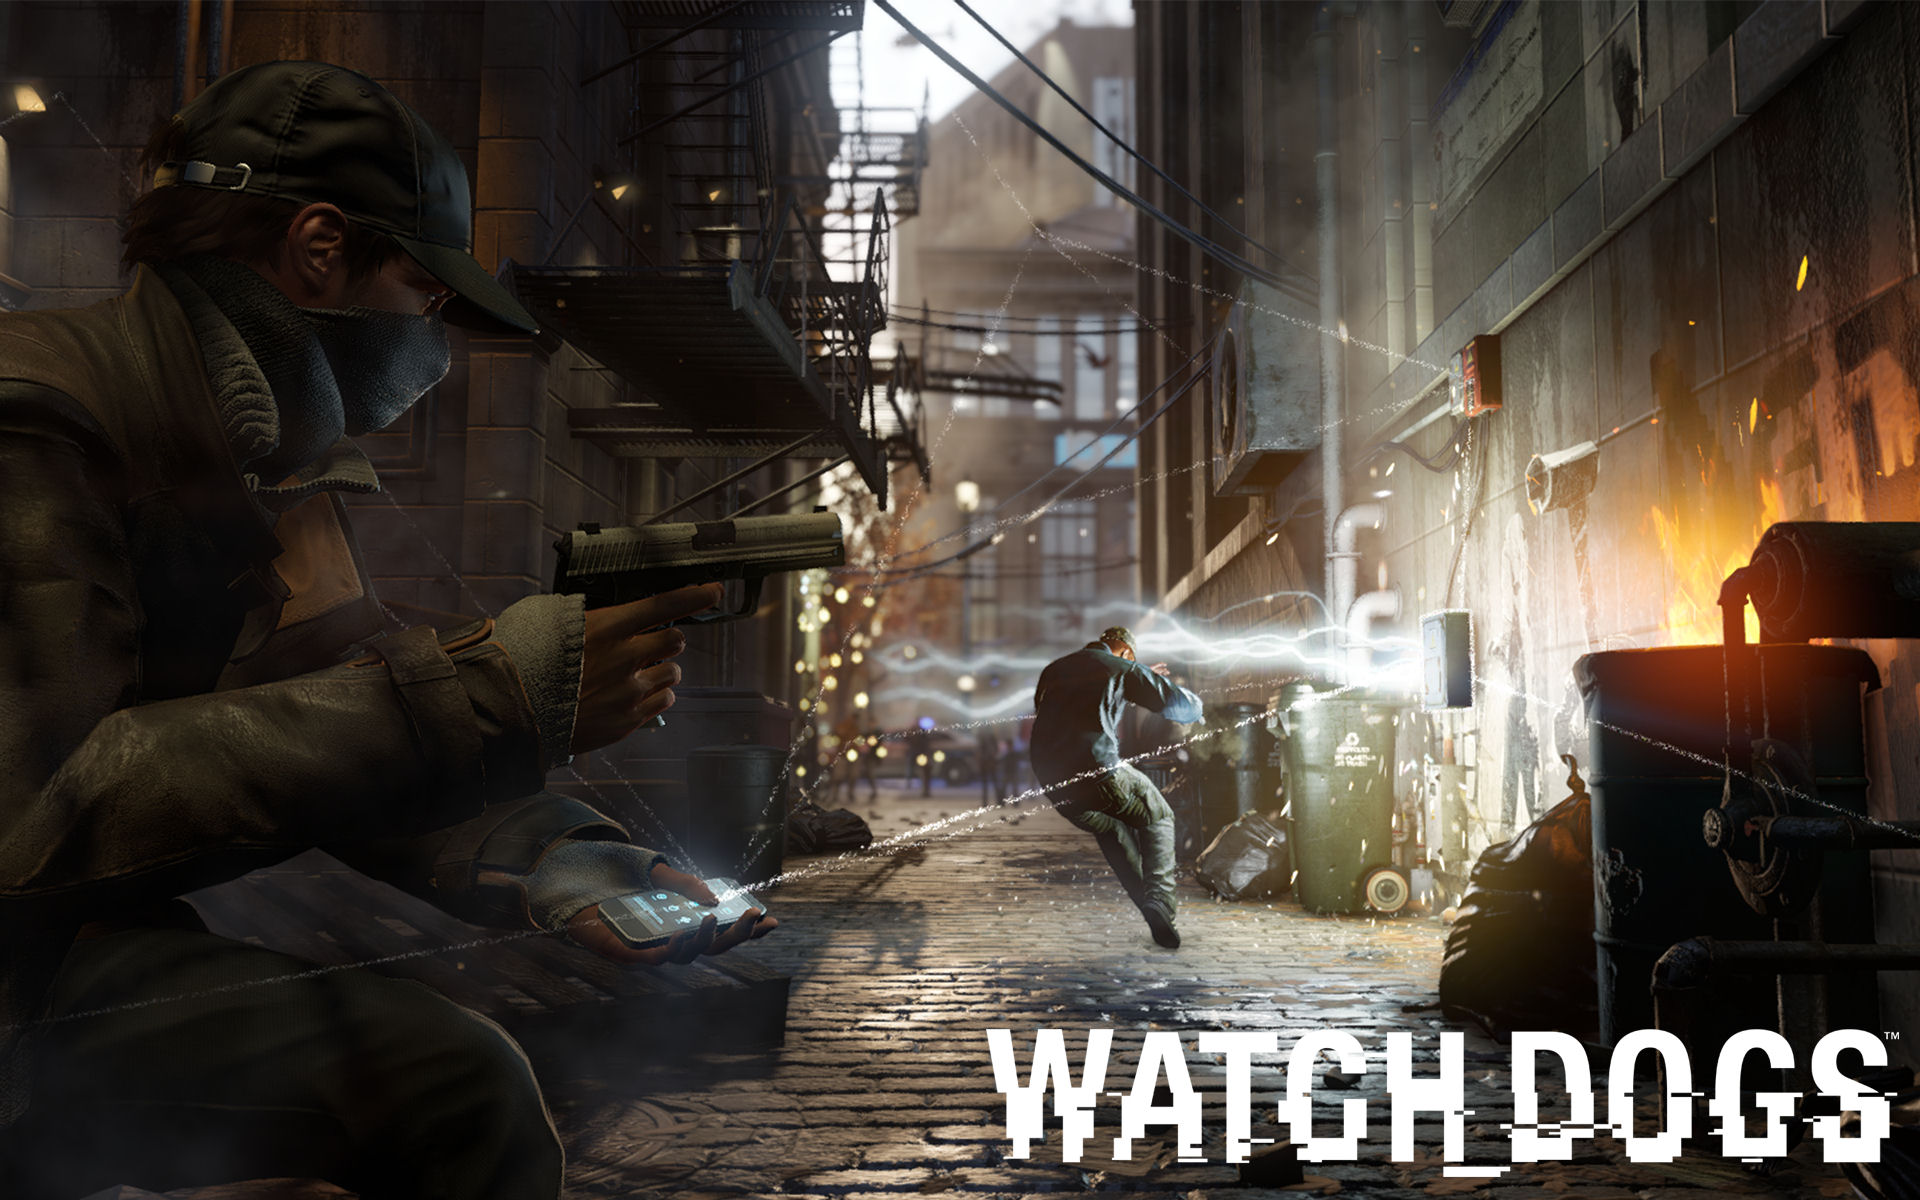 Watch Dogs Gameplay Wallpaper